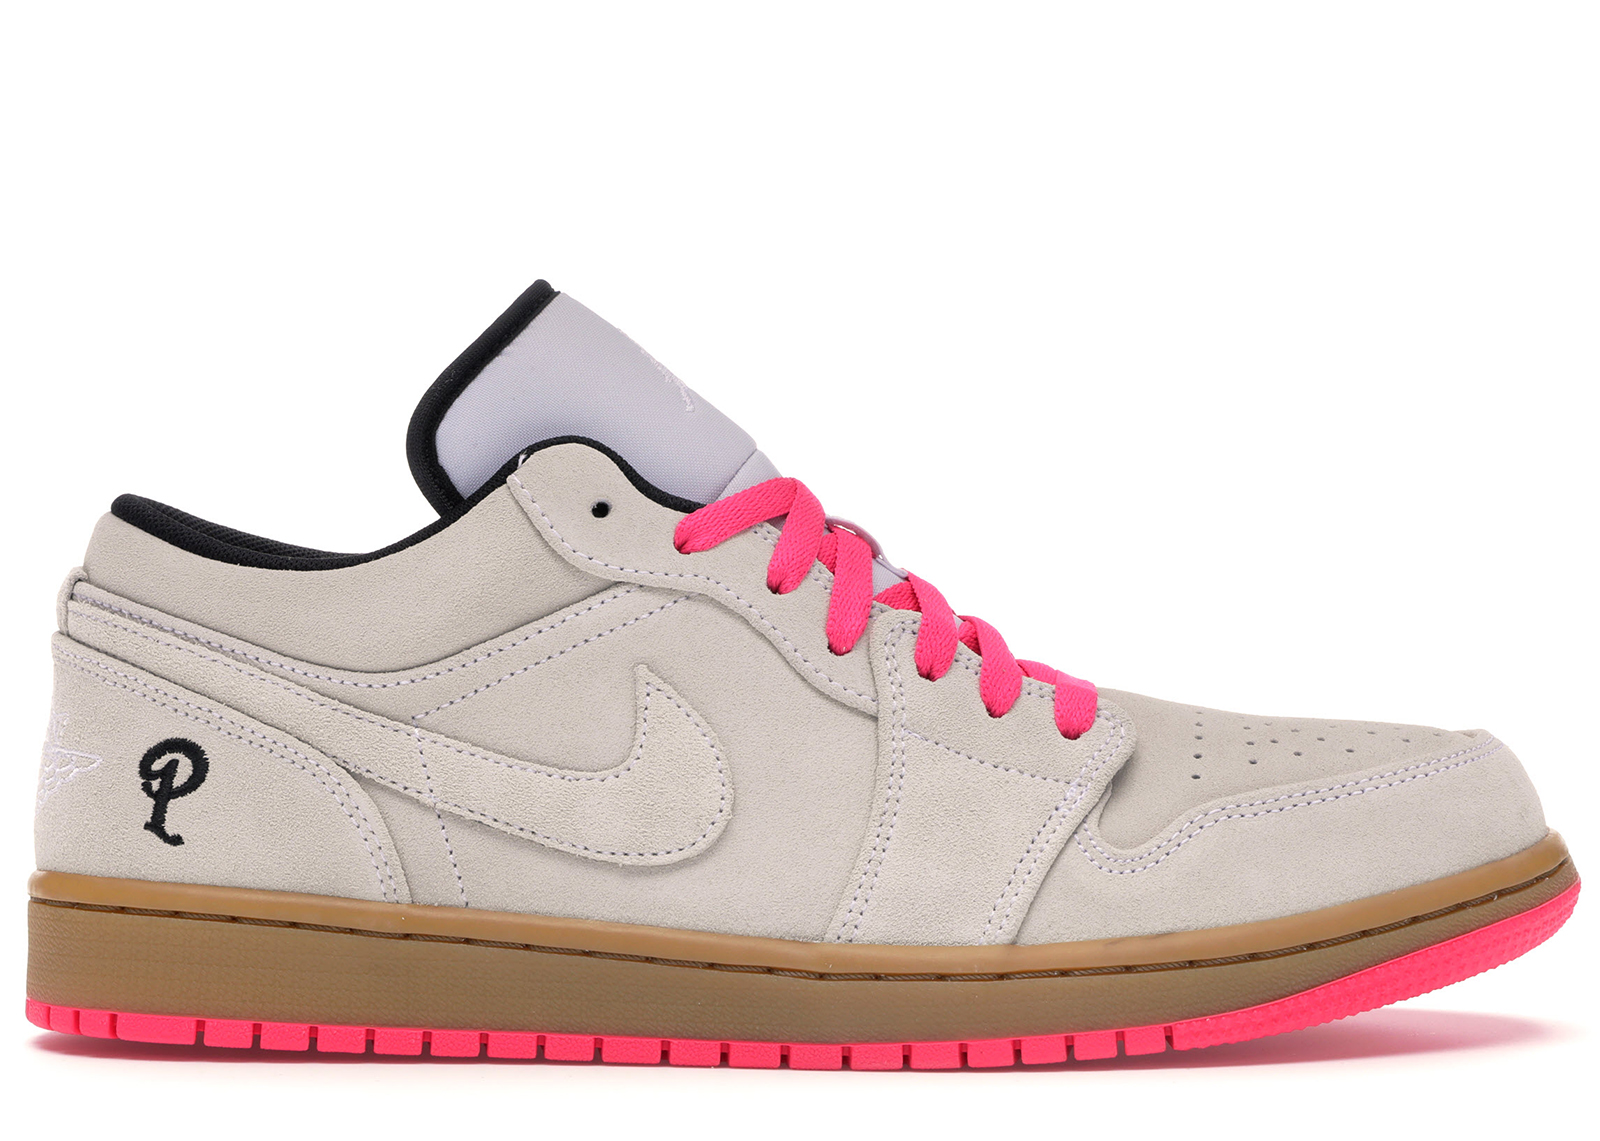 Jordan 1 Low Sneaker Politics